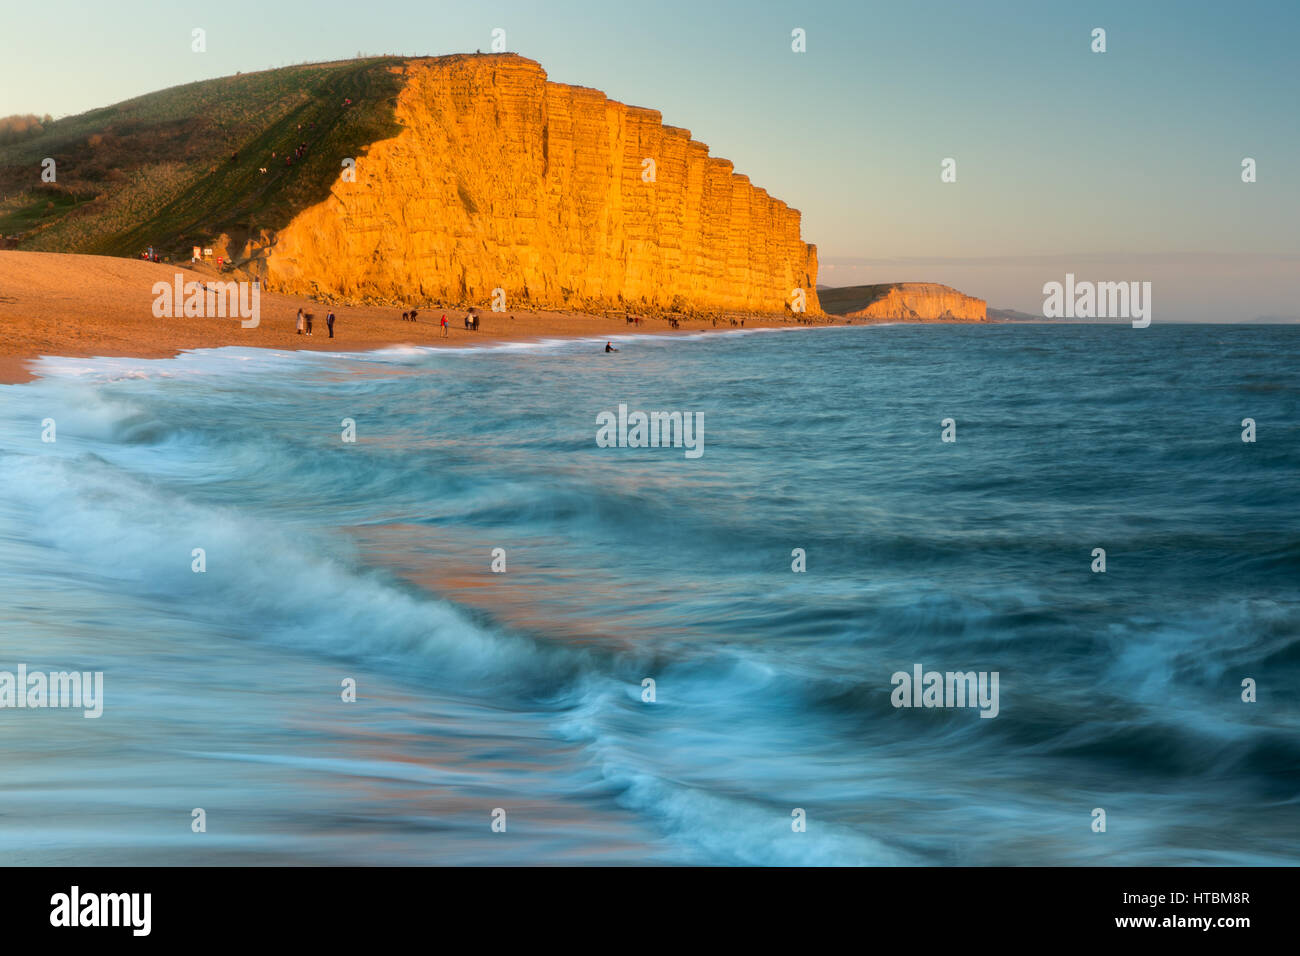 Der Strand unterhalb East Cliff, West Bay, Jurassic Coast, Dorset, England, UK Stockbild